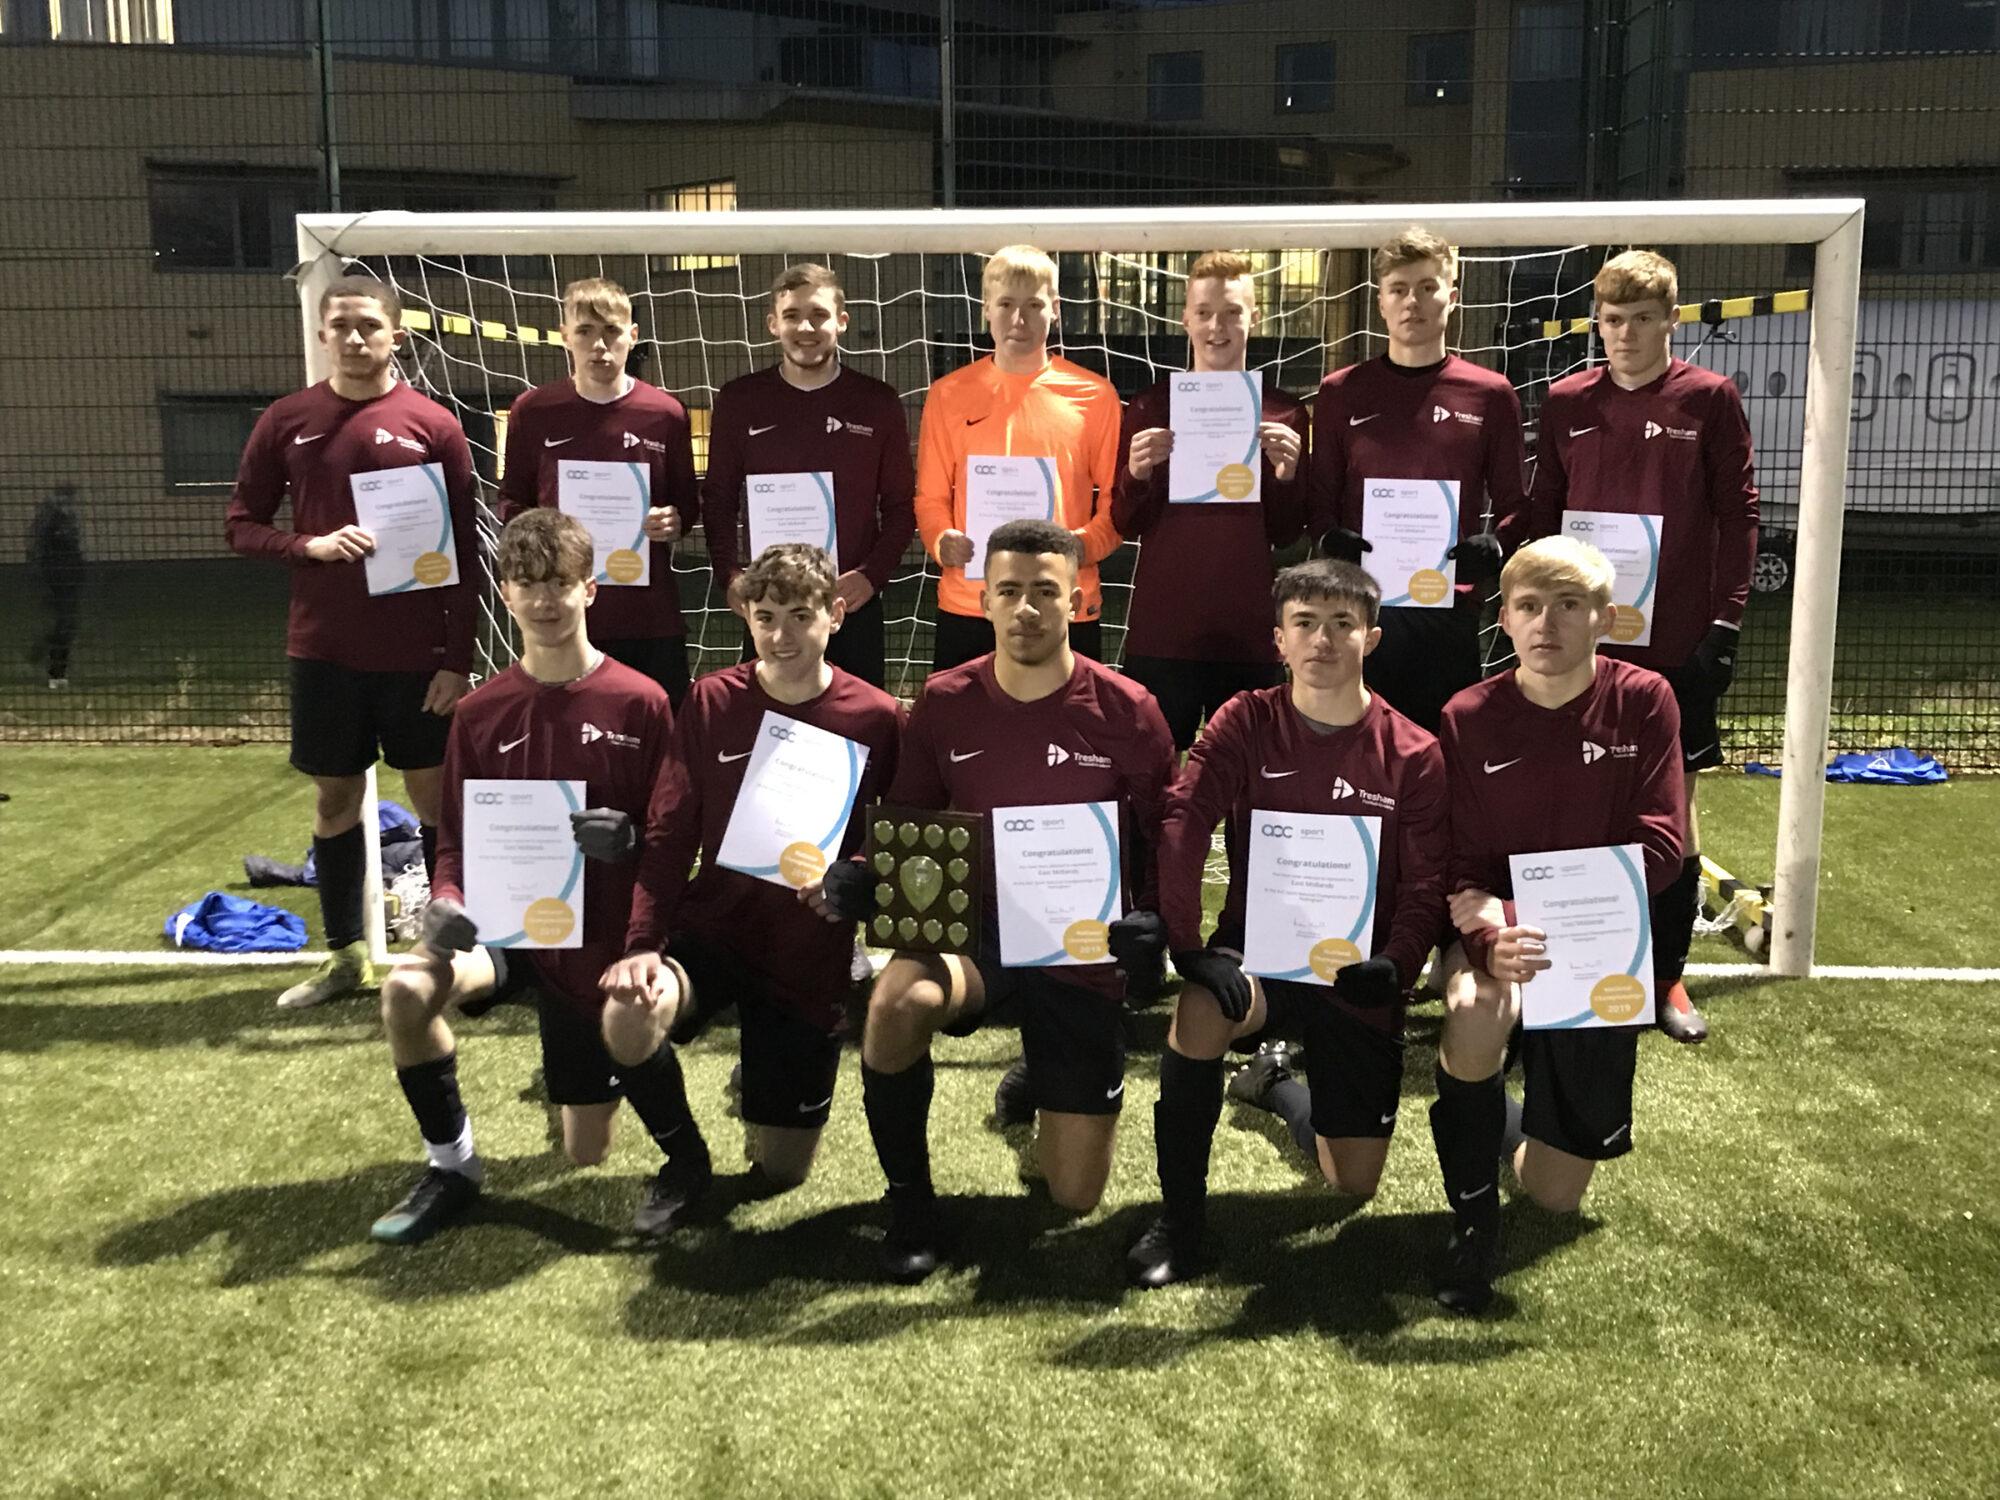 Tresham College Football Academy regional win 2018